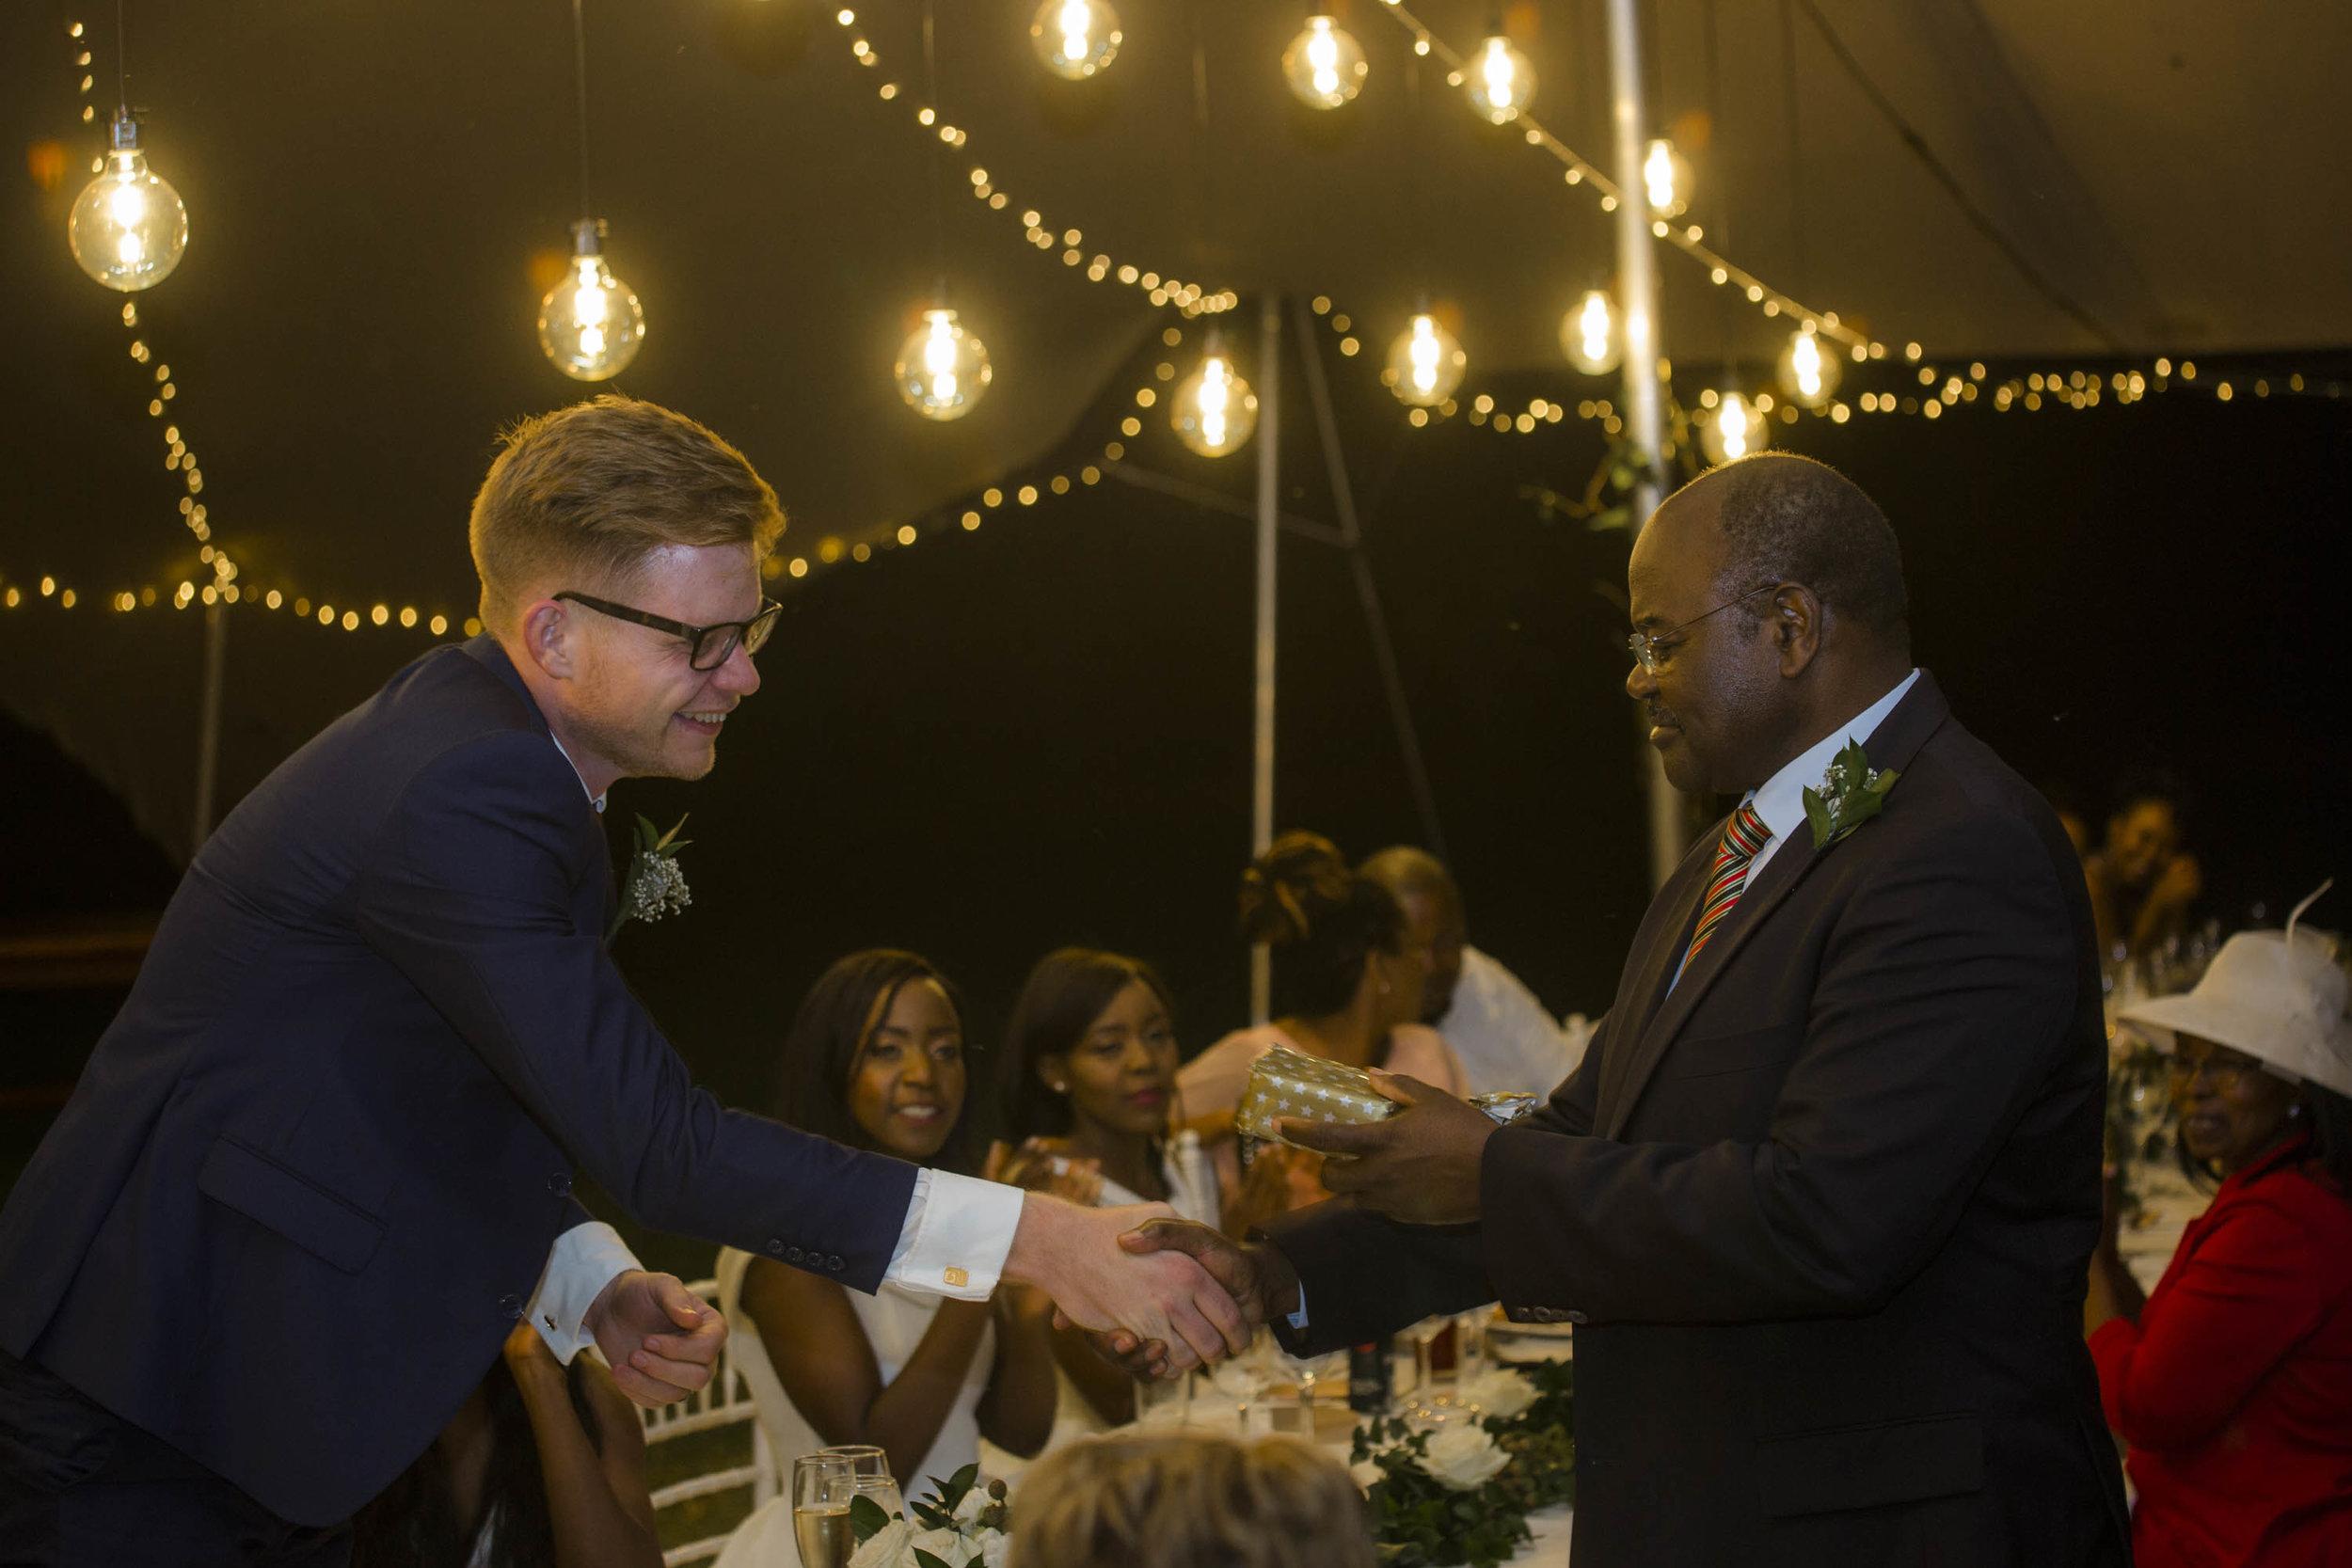 103-natural-wedding-photographers-johannesburg.JPG